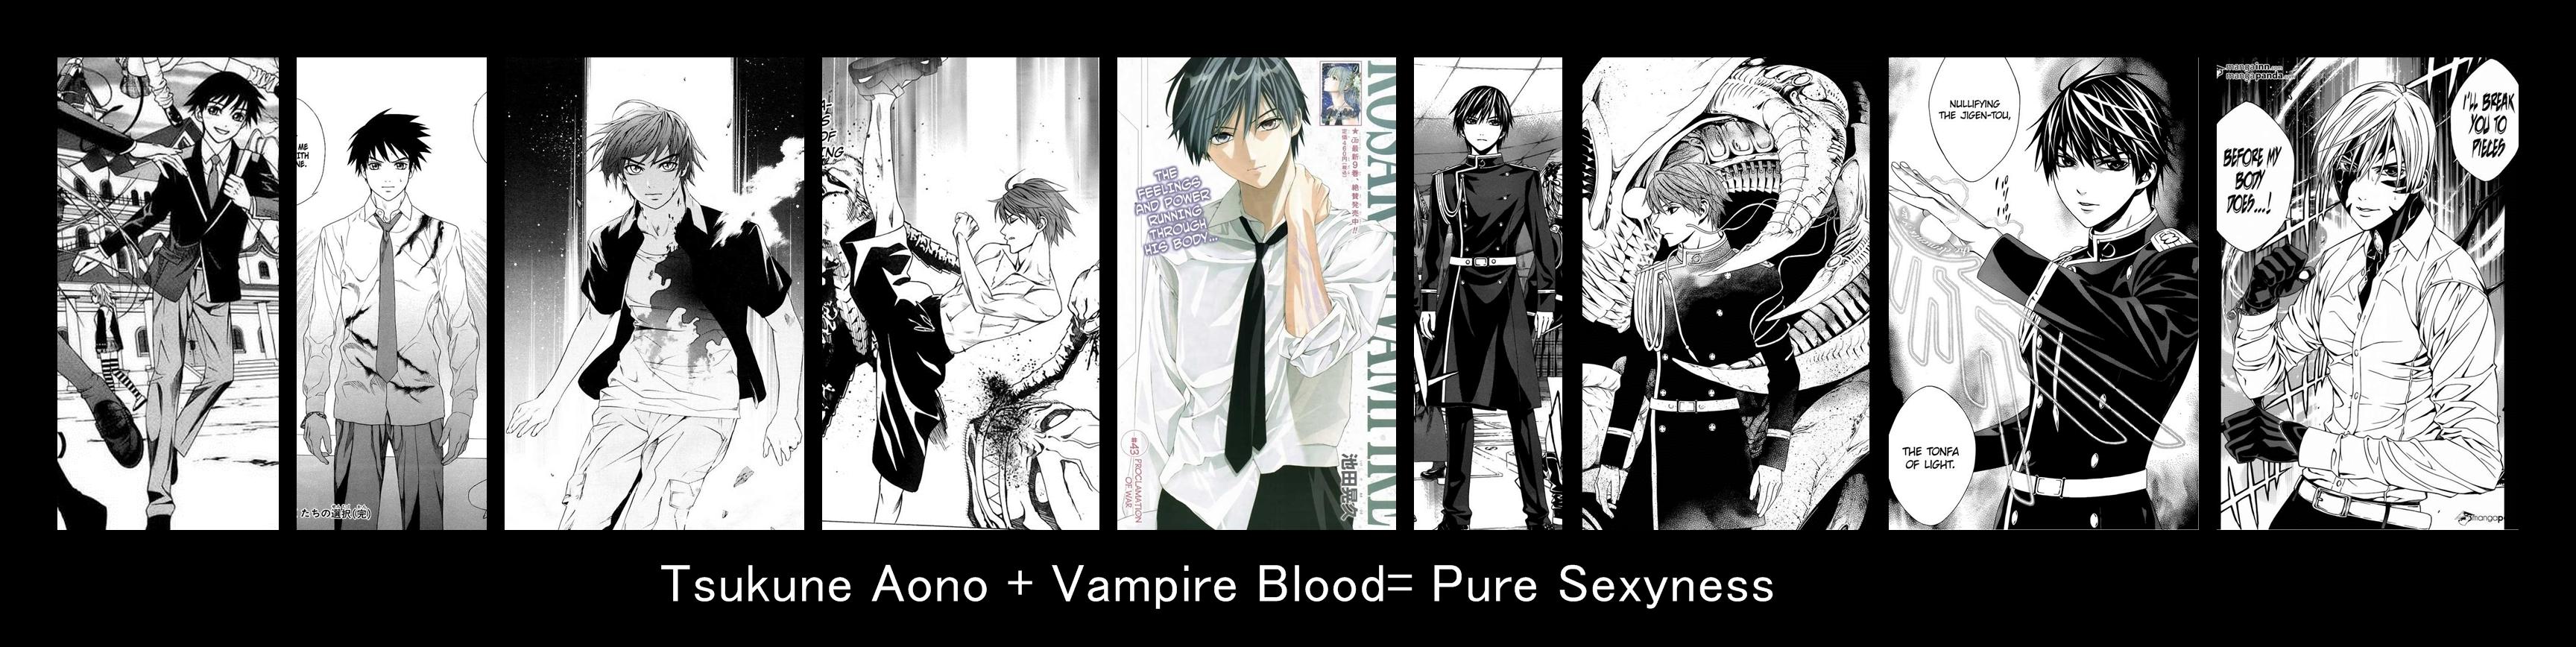 Anime De Rosario Vampire rosario vampire: evolutionf1-03neptune on deviantart